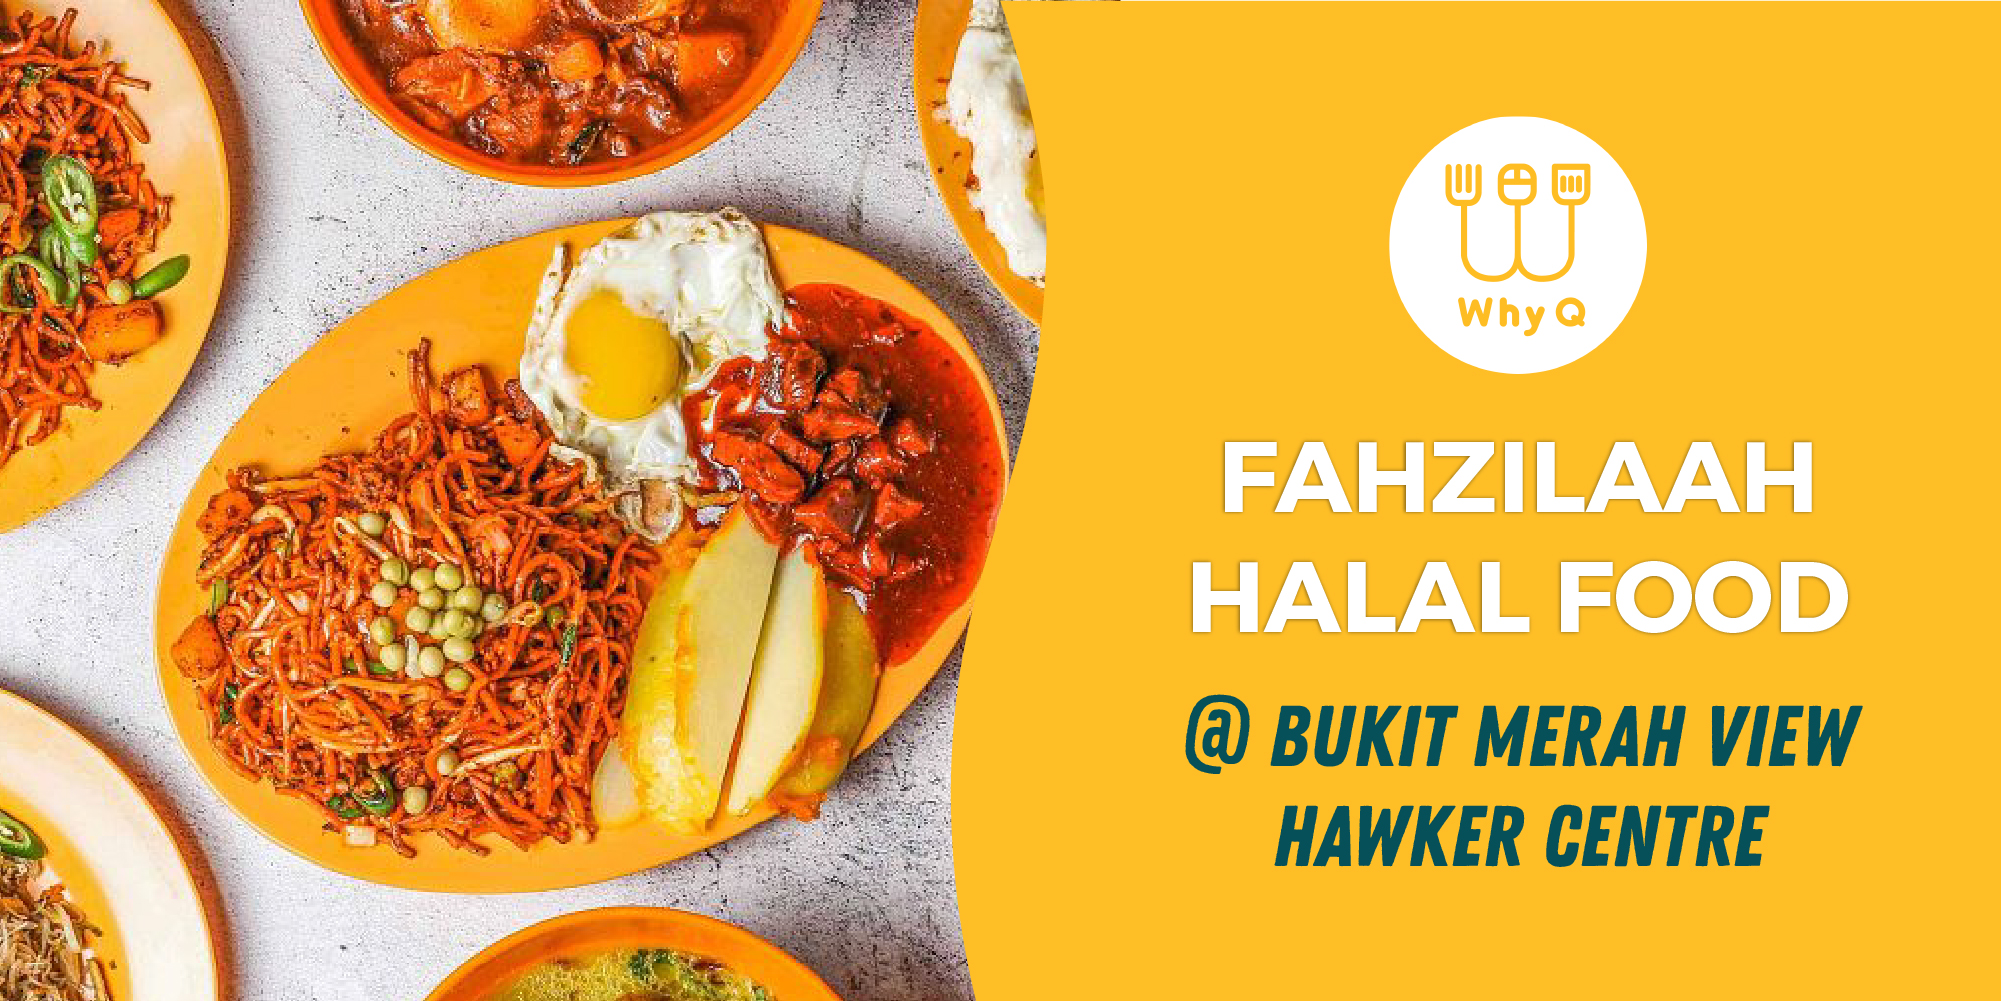 WhyQ halal guide Fahzilaah food at bukit merah view hawker